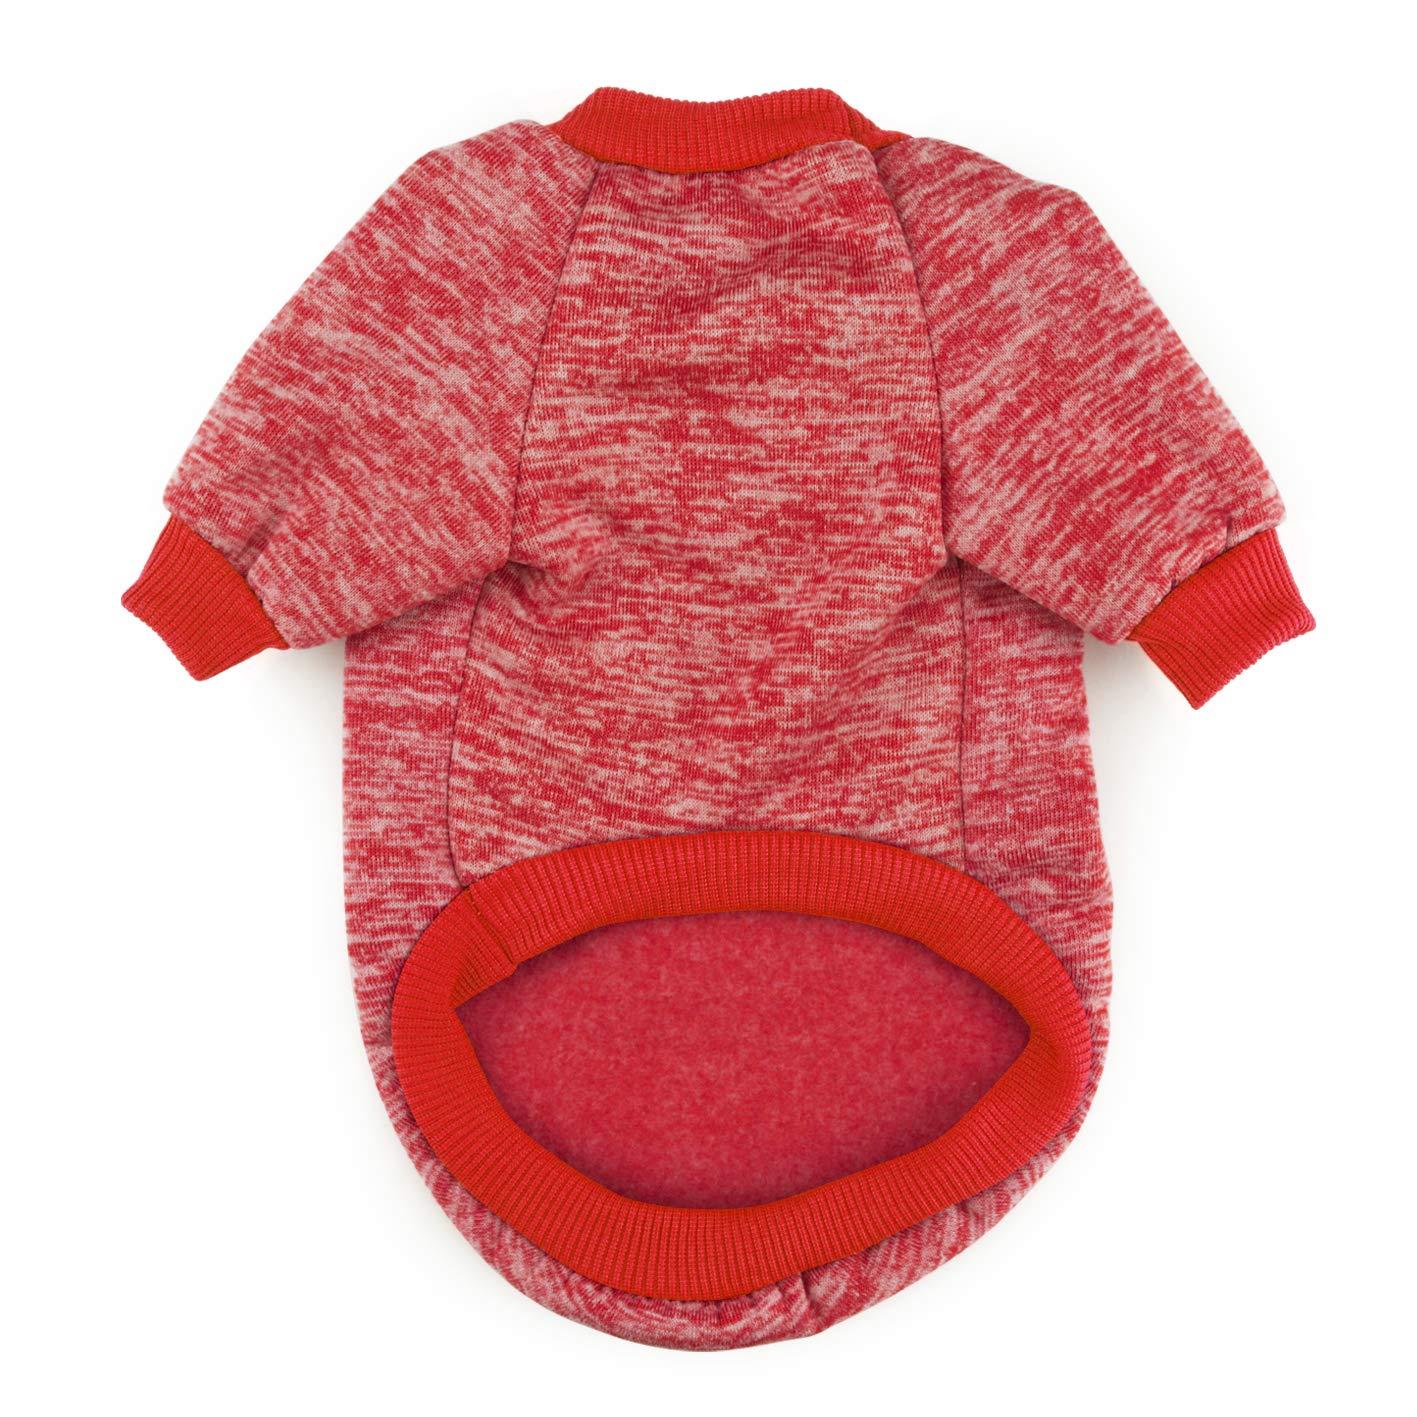 Idepet Pet Cat Dog Sweater,Warm Dog Jumpers Cat Clothes,Fleece Pet Coat for Puppy Small Medium Large Dog,Pink /& Grey XL, Purple